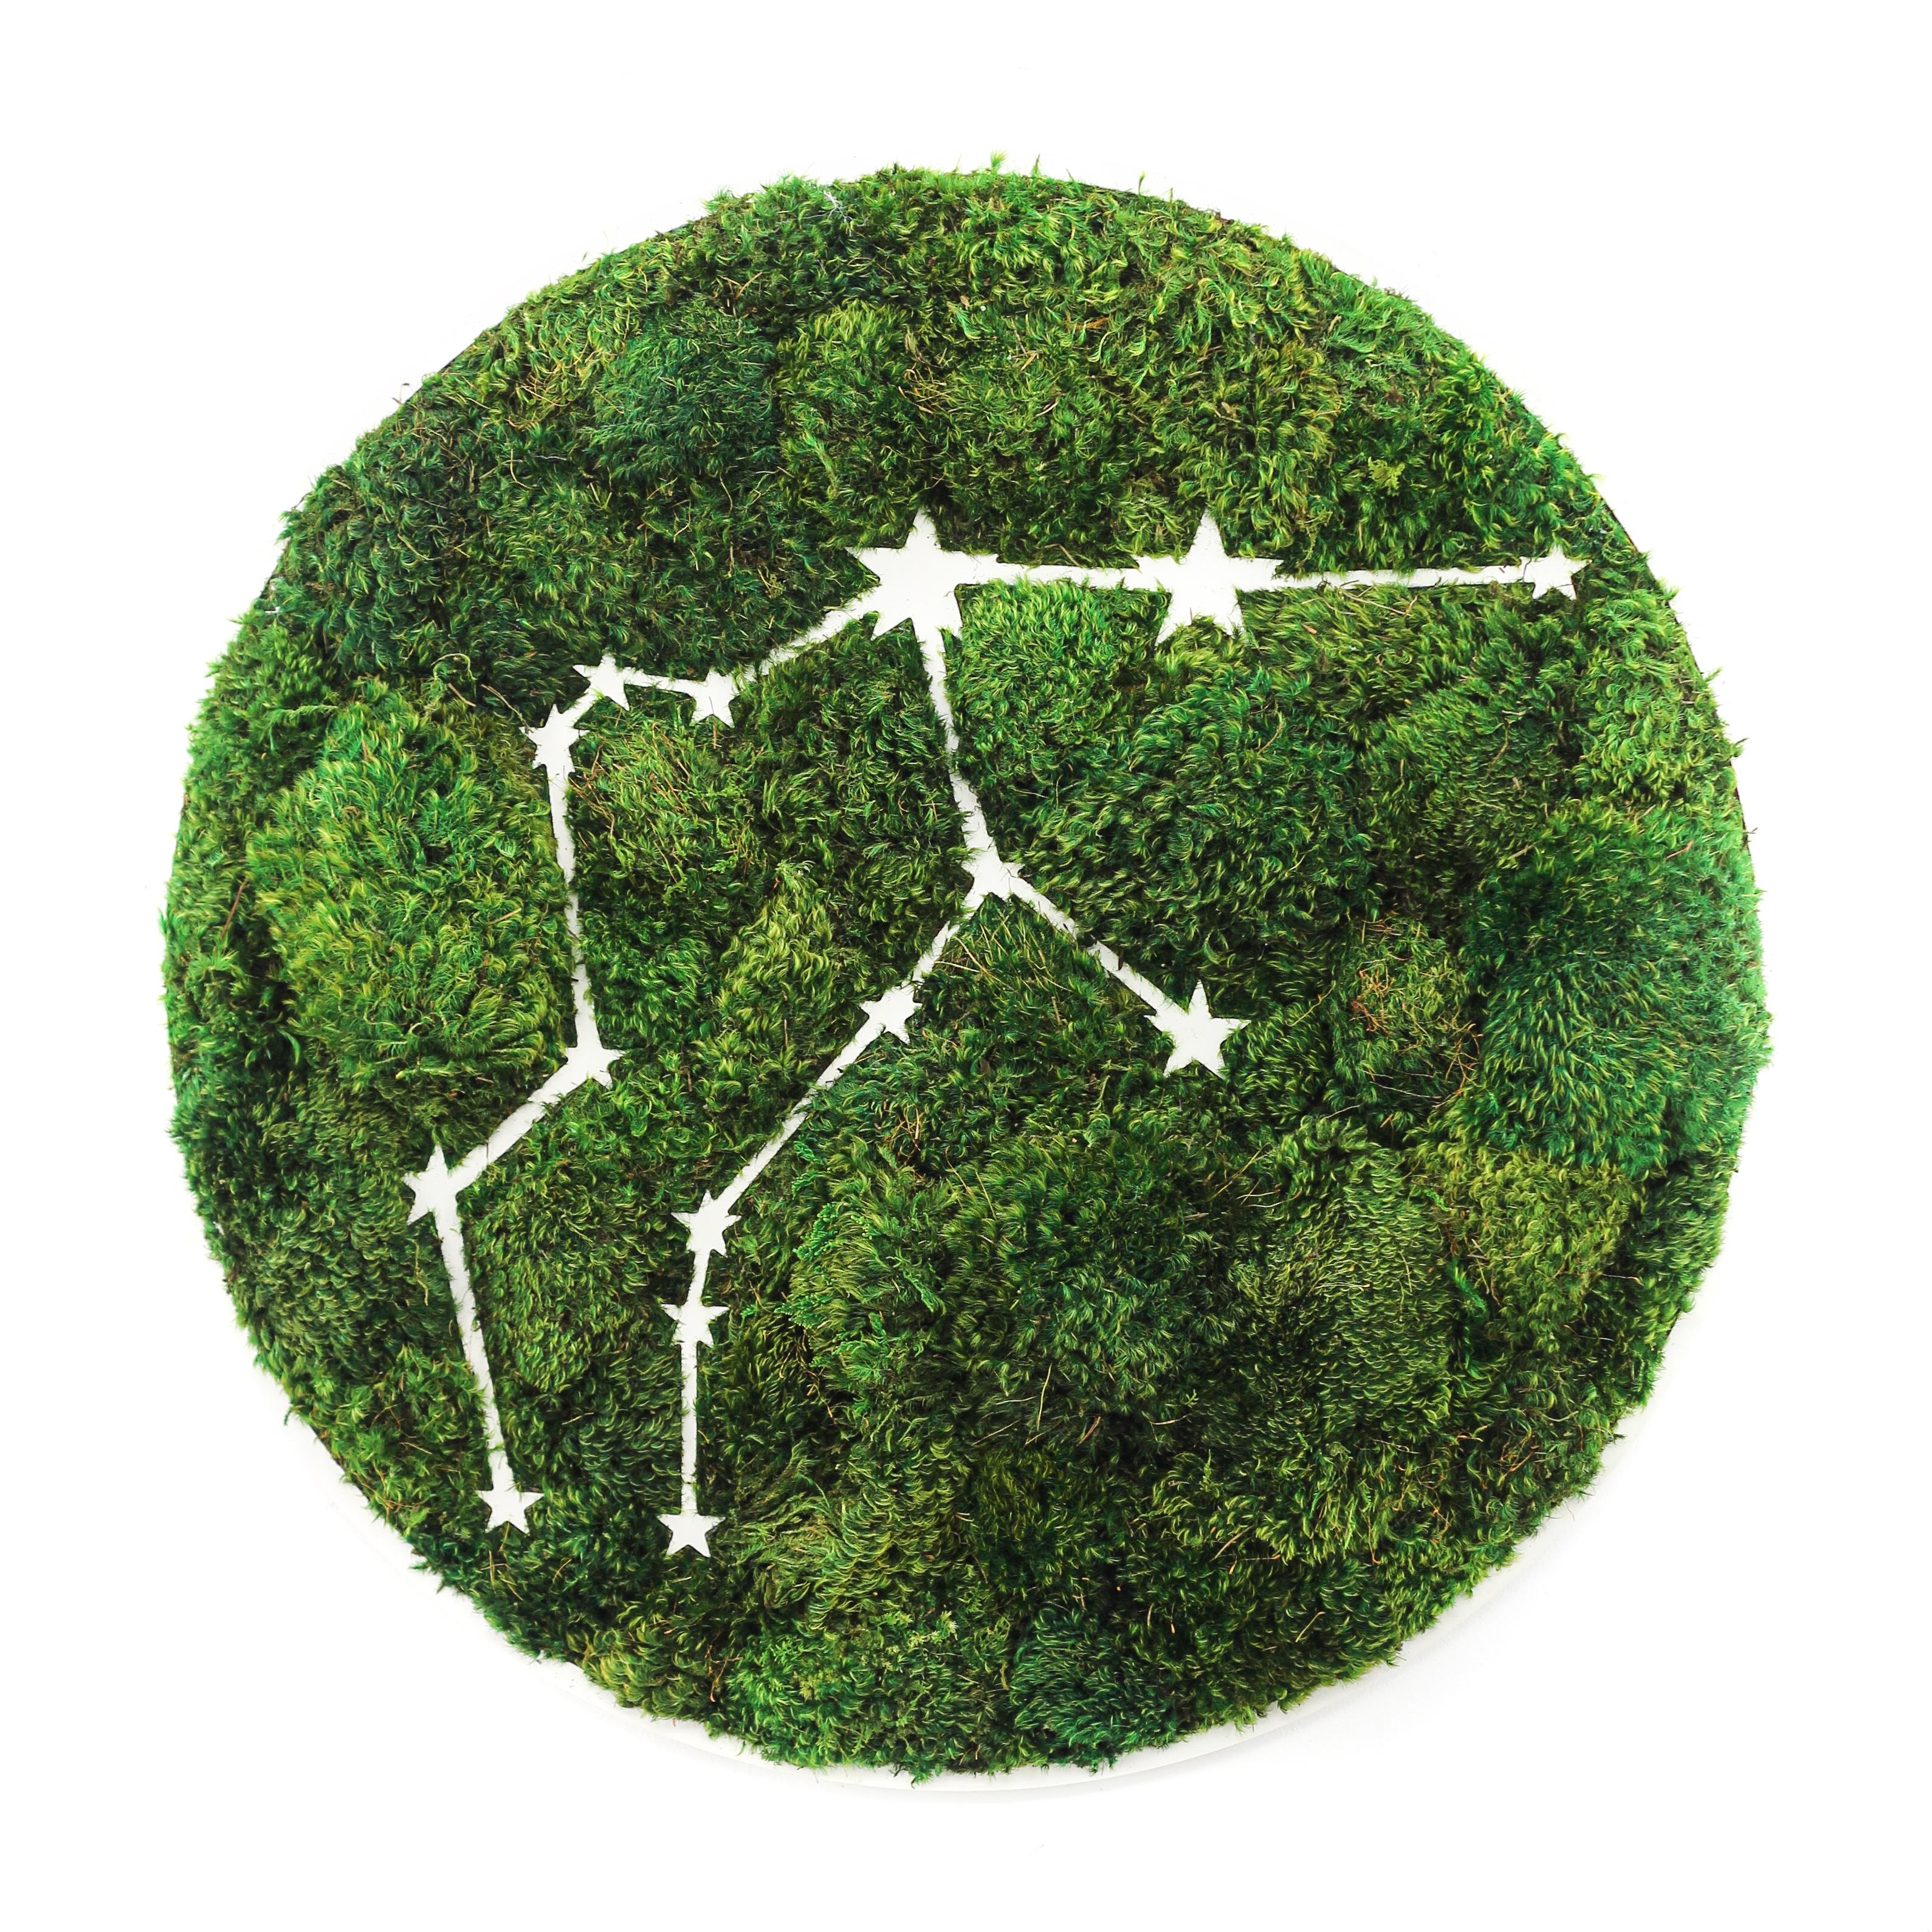 "Aquarius Constellation - Moss Wall Art (30"" Diameter)"